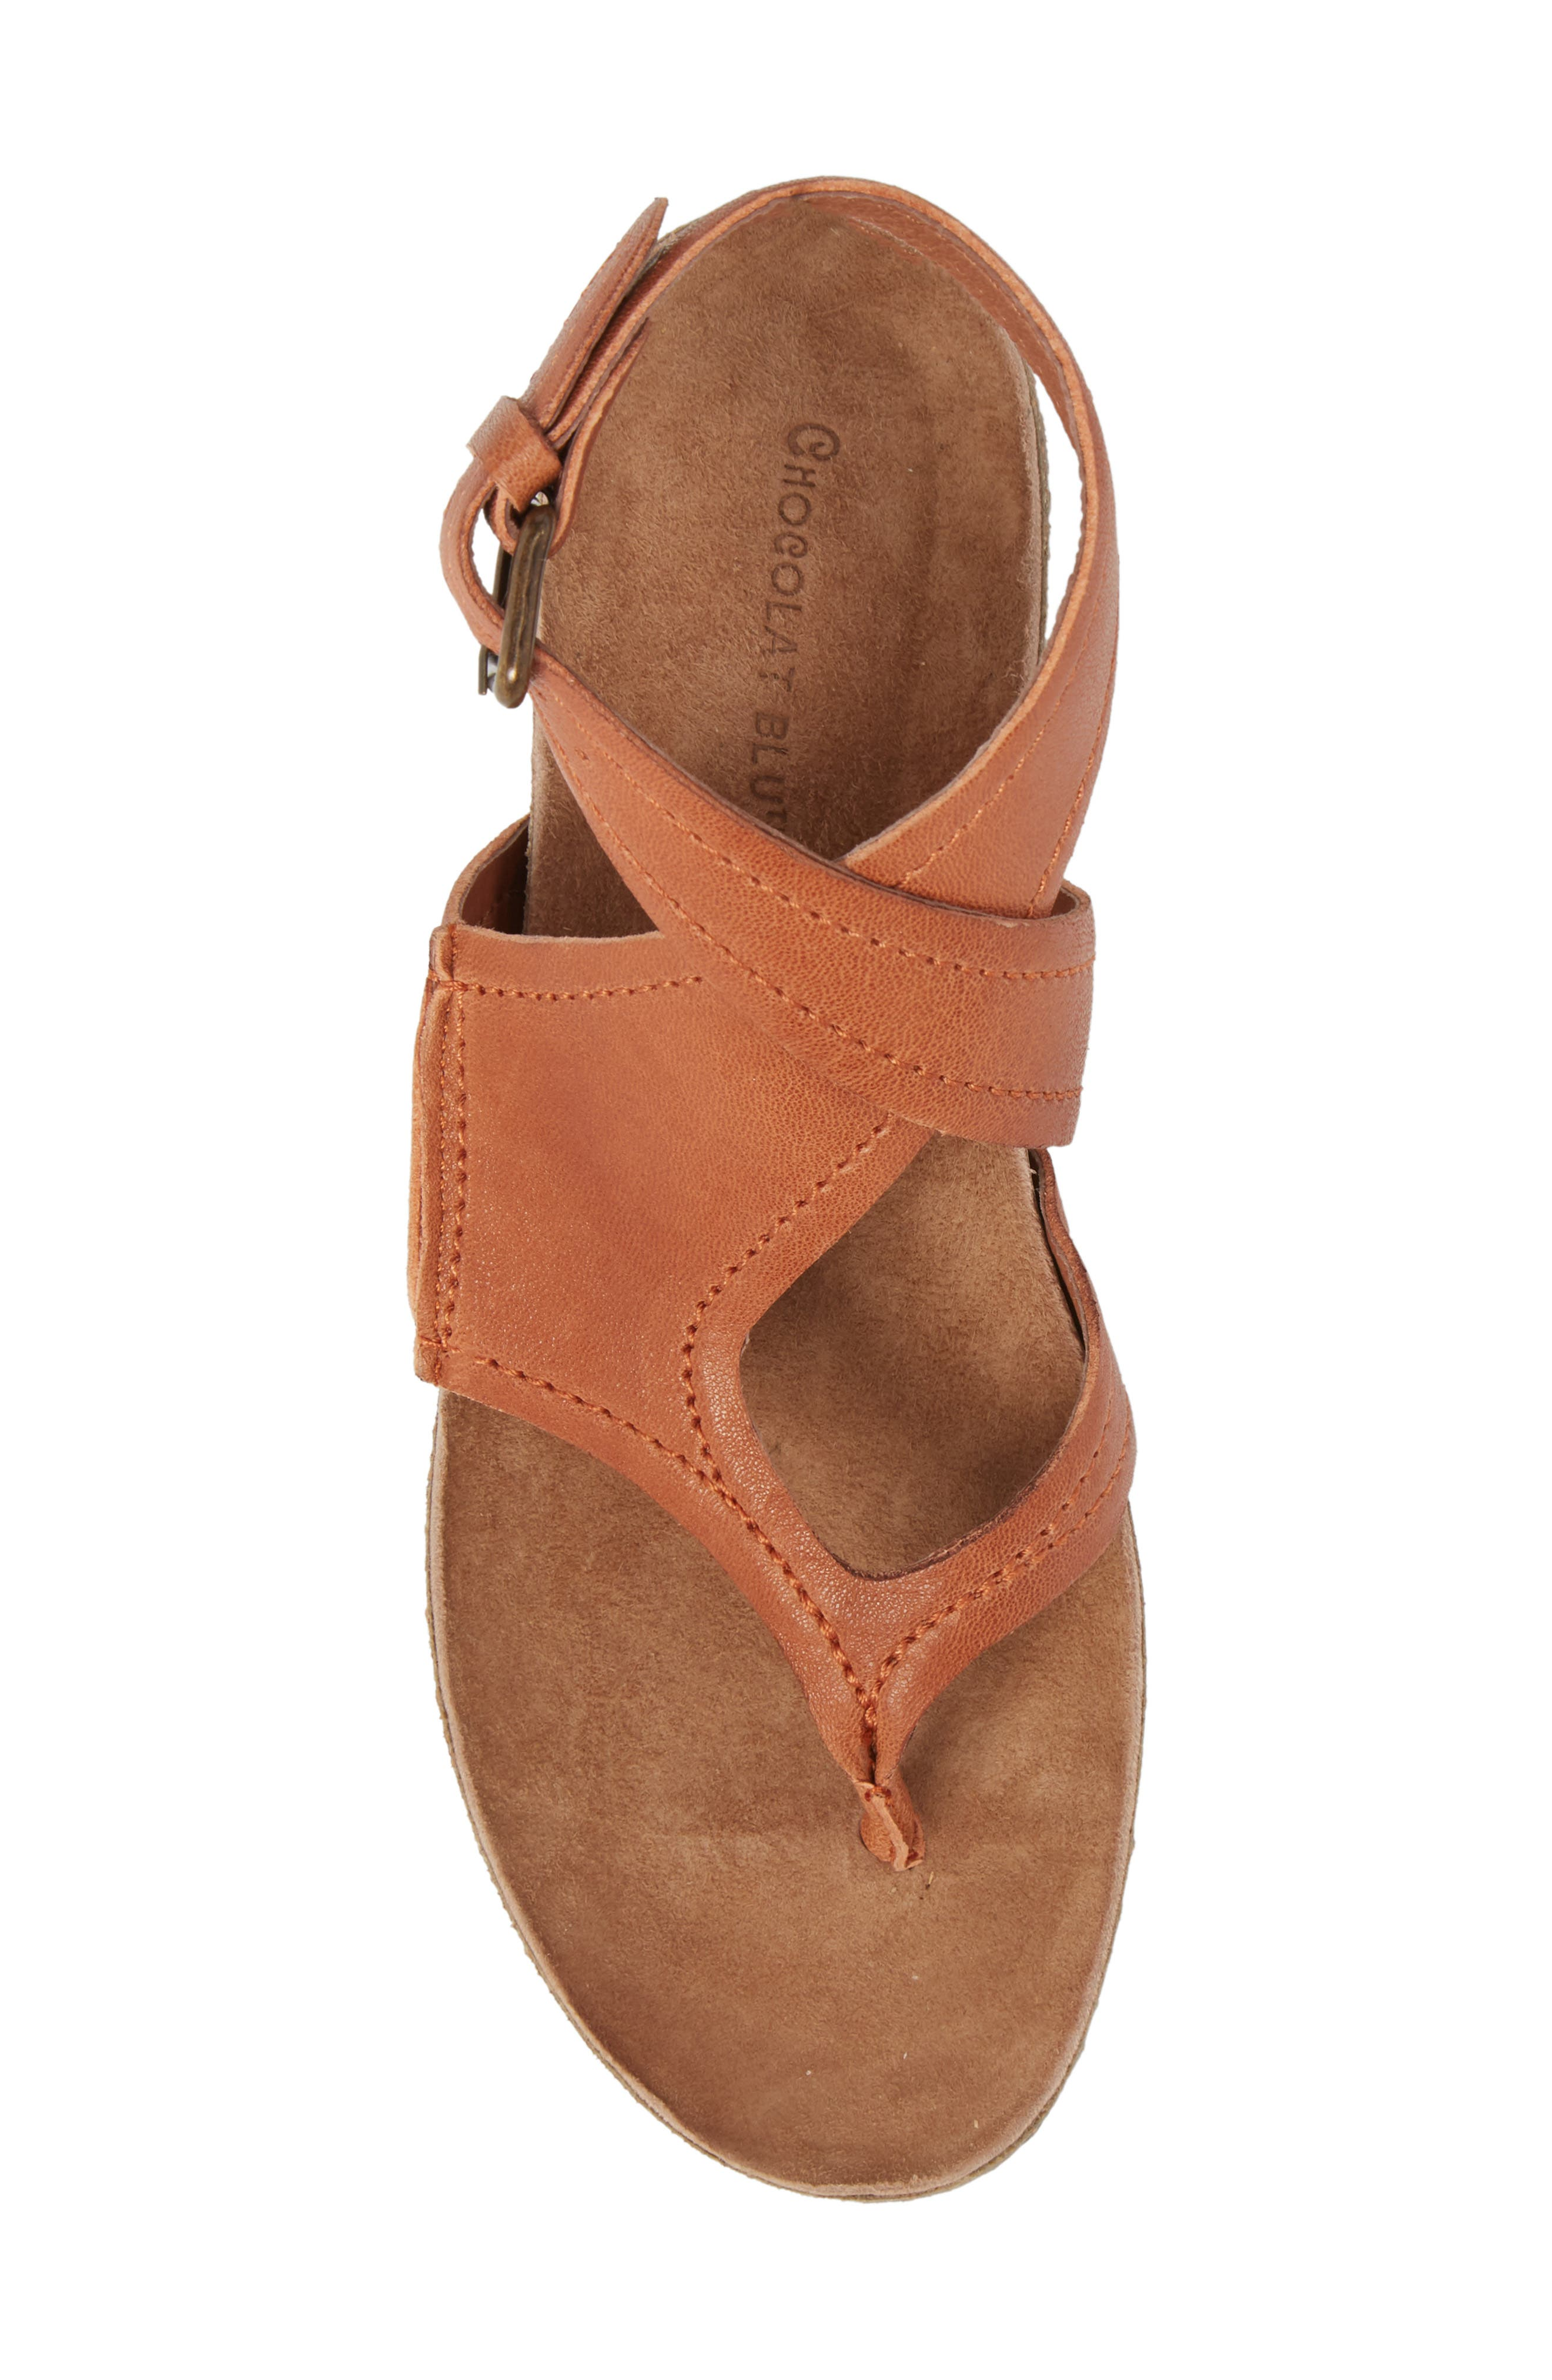 Yagger Sandal,                             Alternate thumbnail 5, color,                             Camel Leather